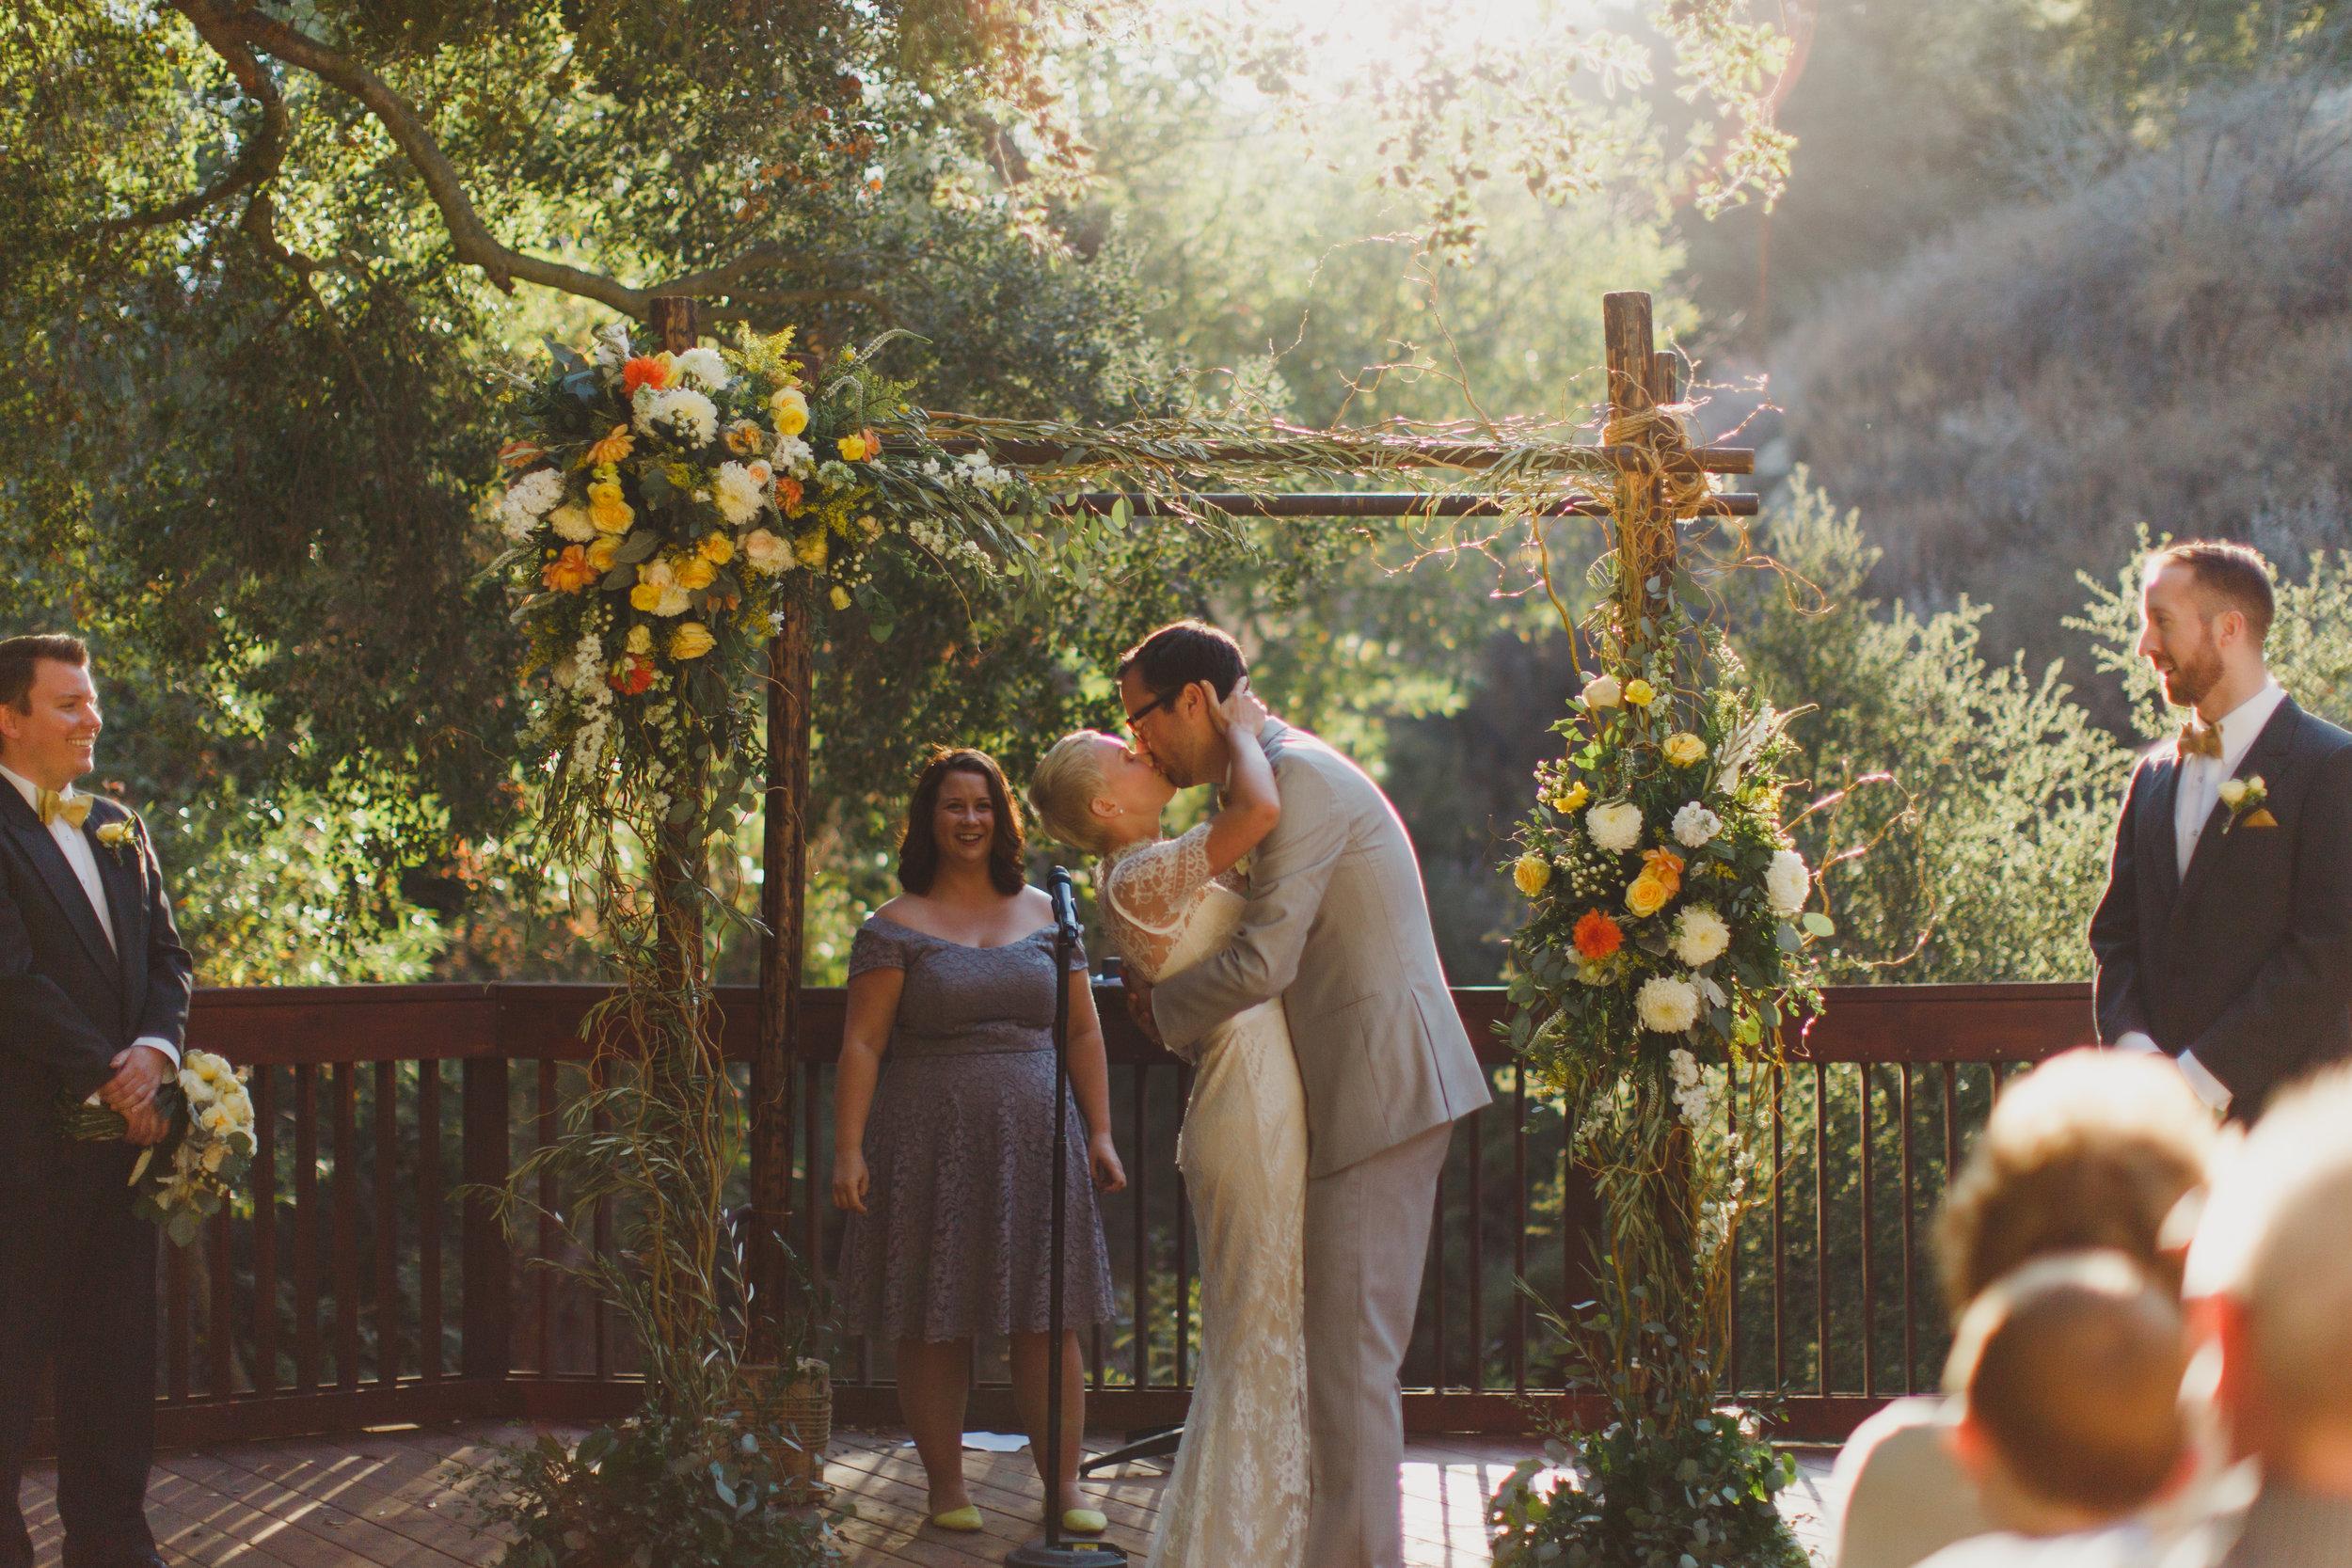 Adam Nicole-Adam Nicole Wedding edited 2-0143.jpg